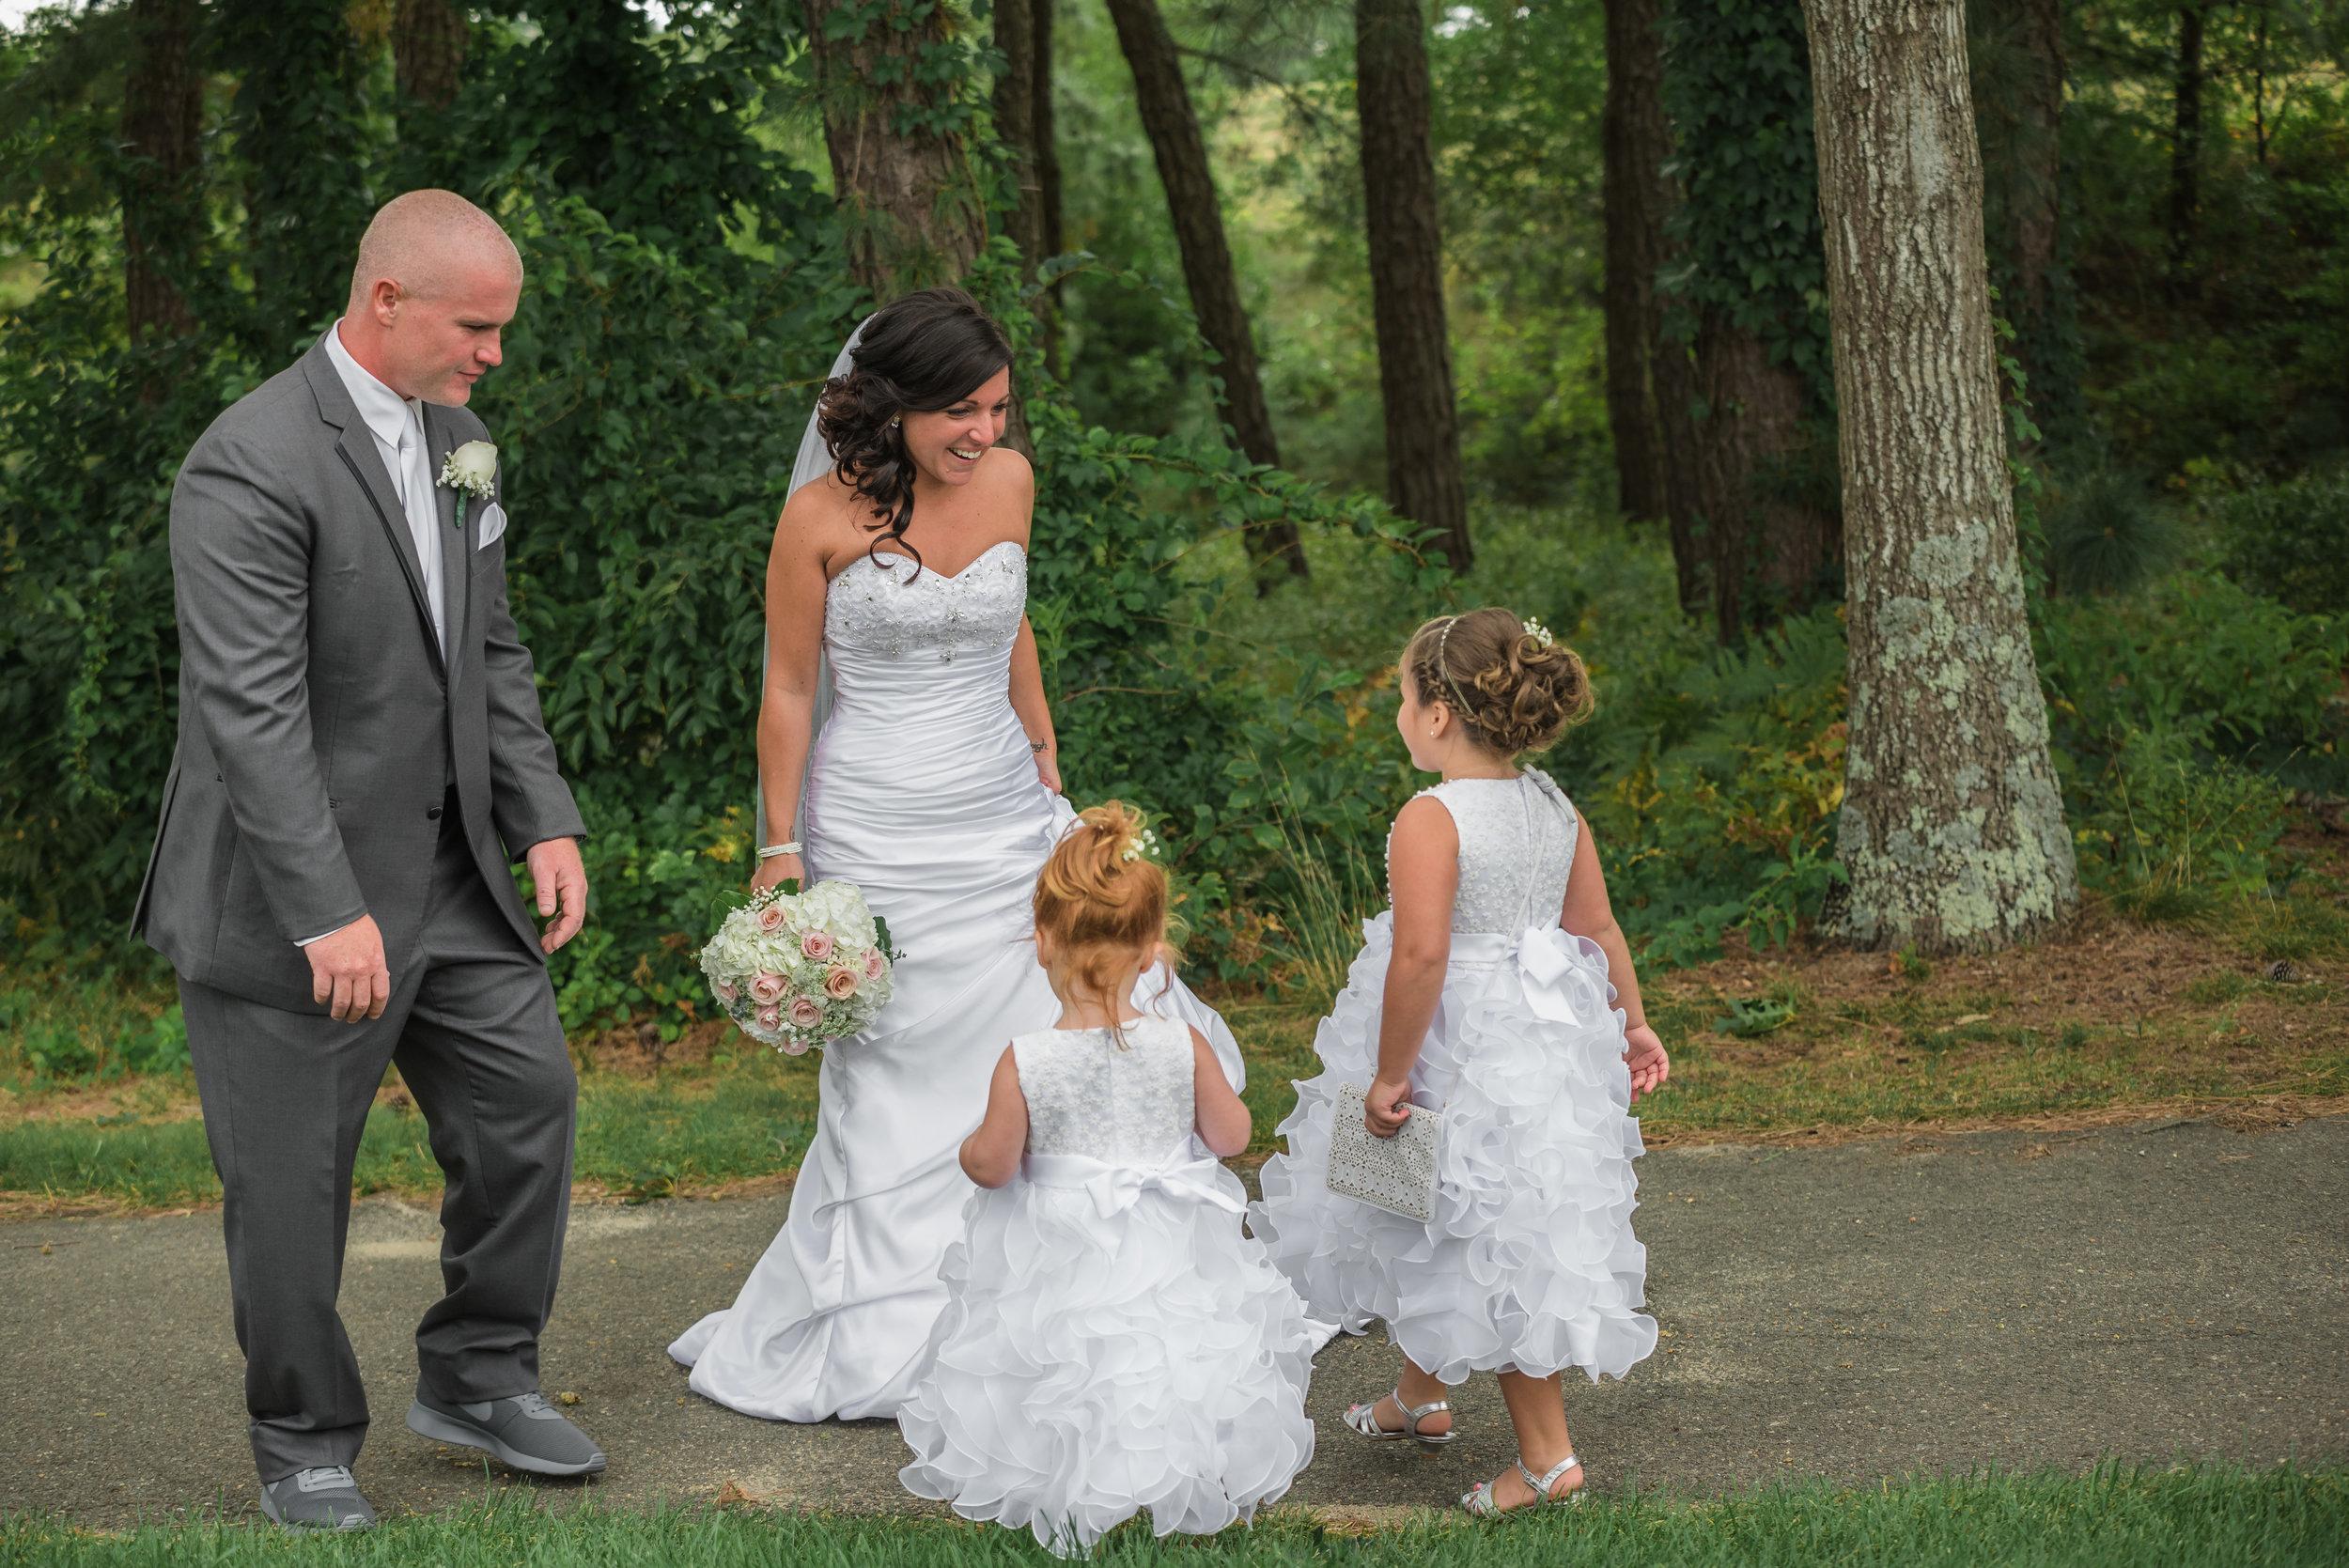 Seaoaks Wedding Photos Steph 15